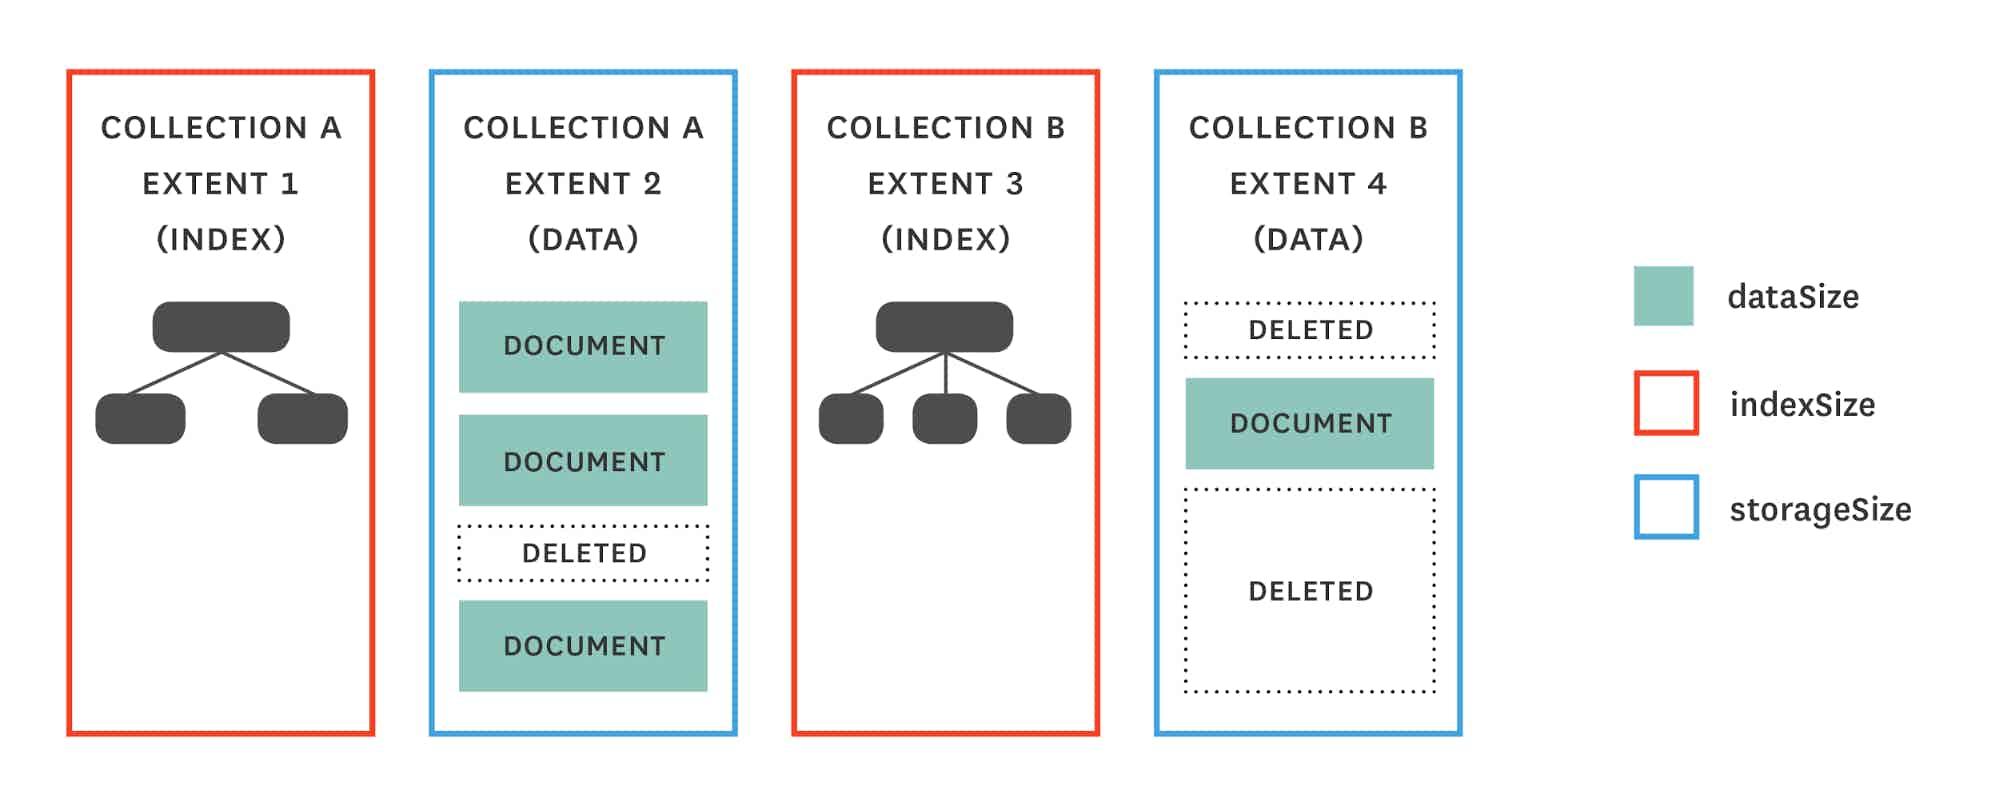 Monitoring MongoDB performance - dbStats storage metrics